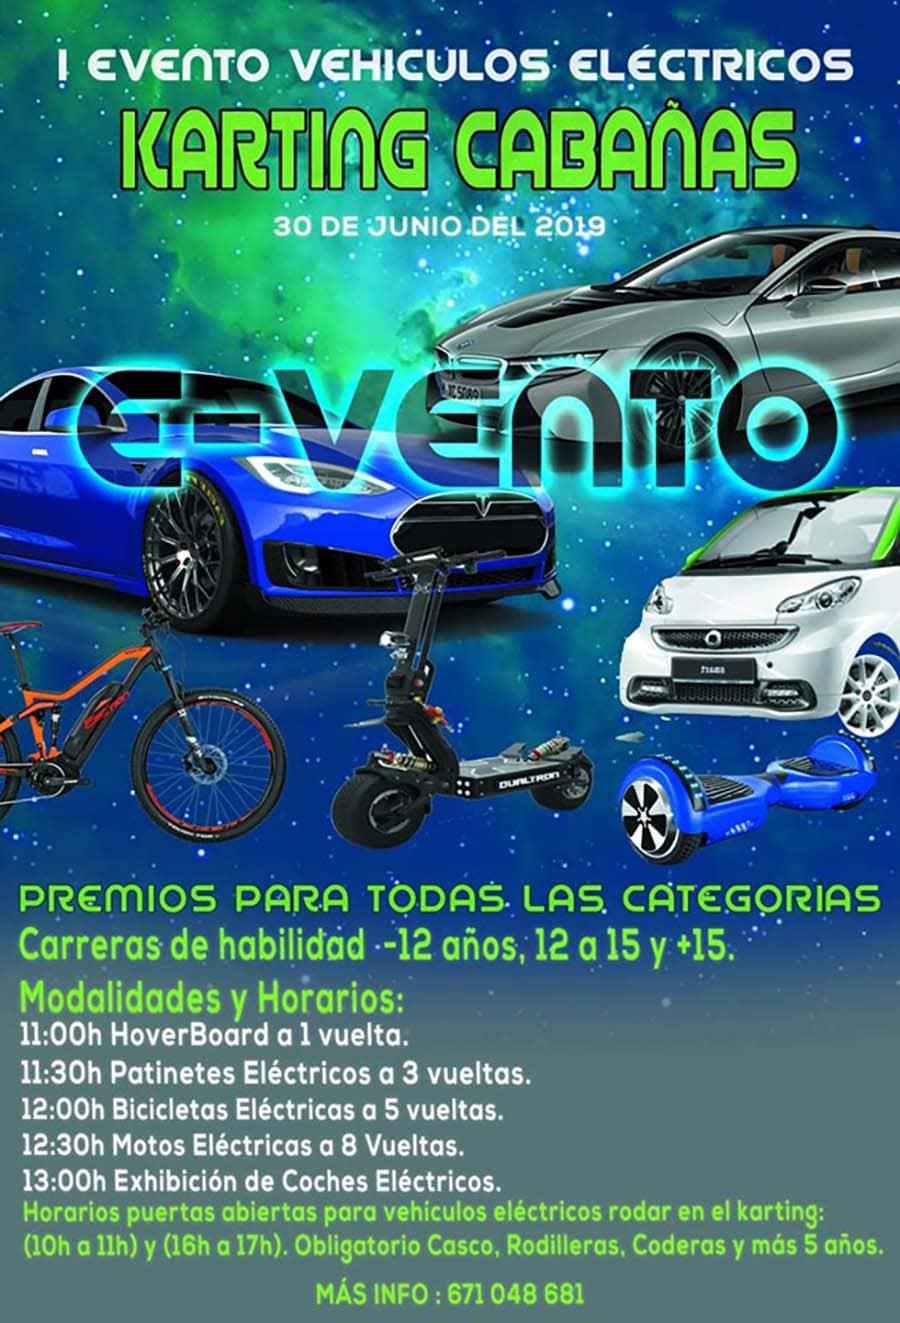 programa evento coches electricos karting cabanas el bierzo